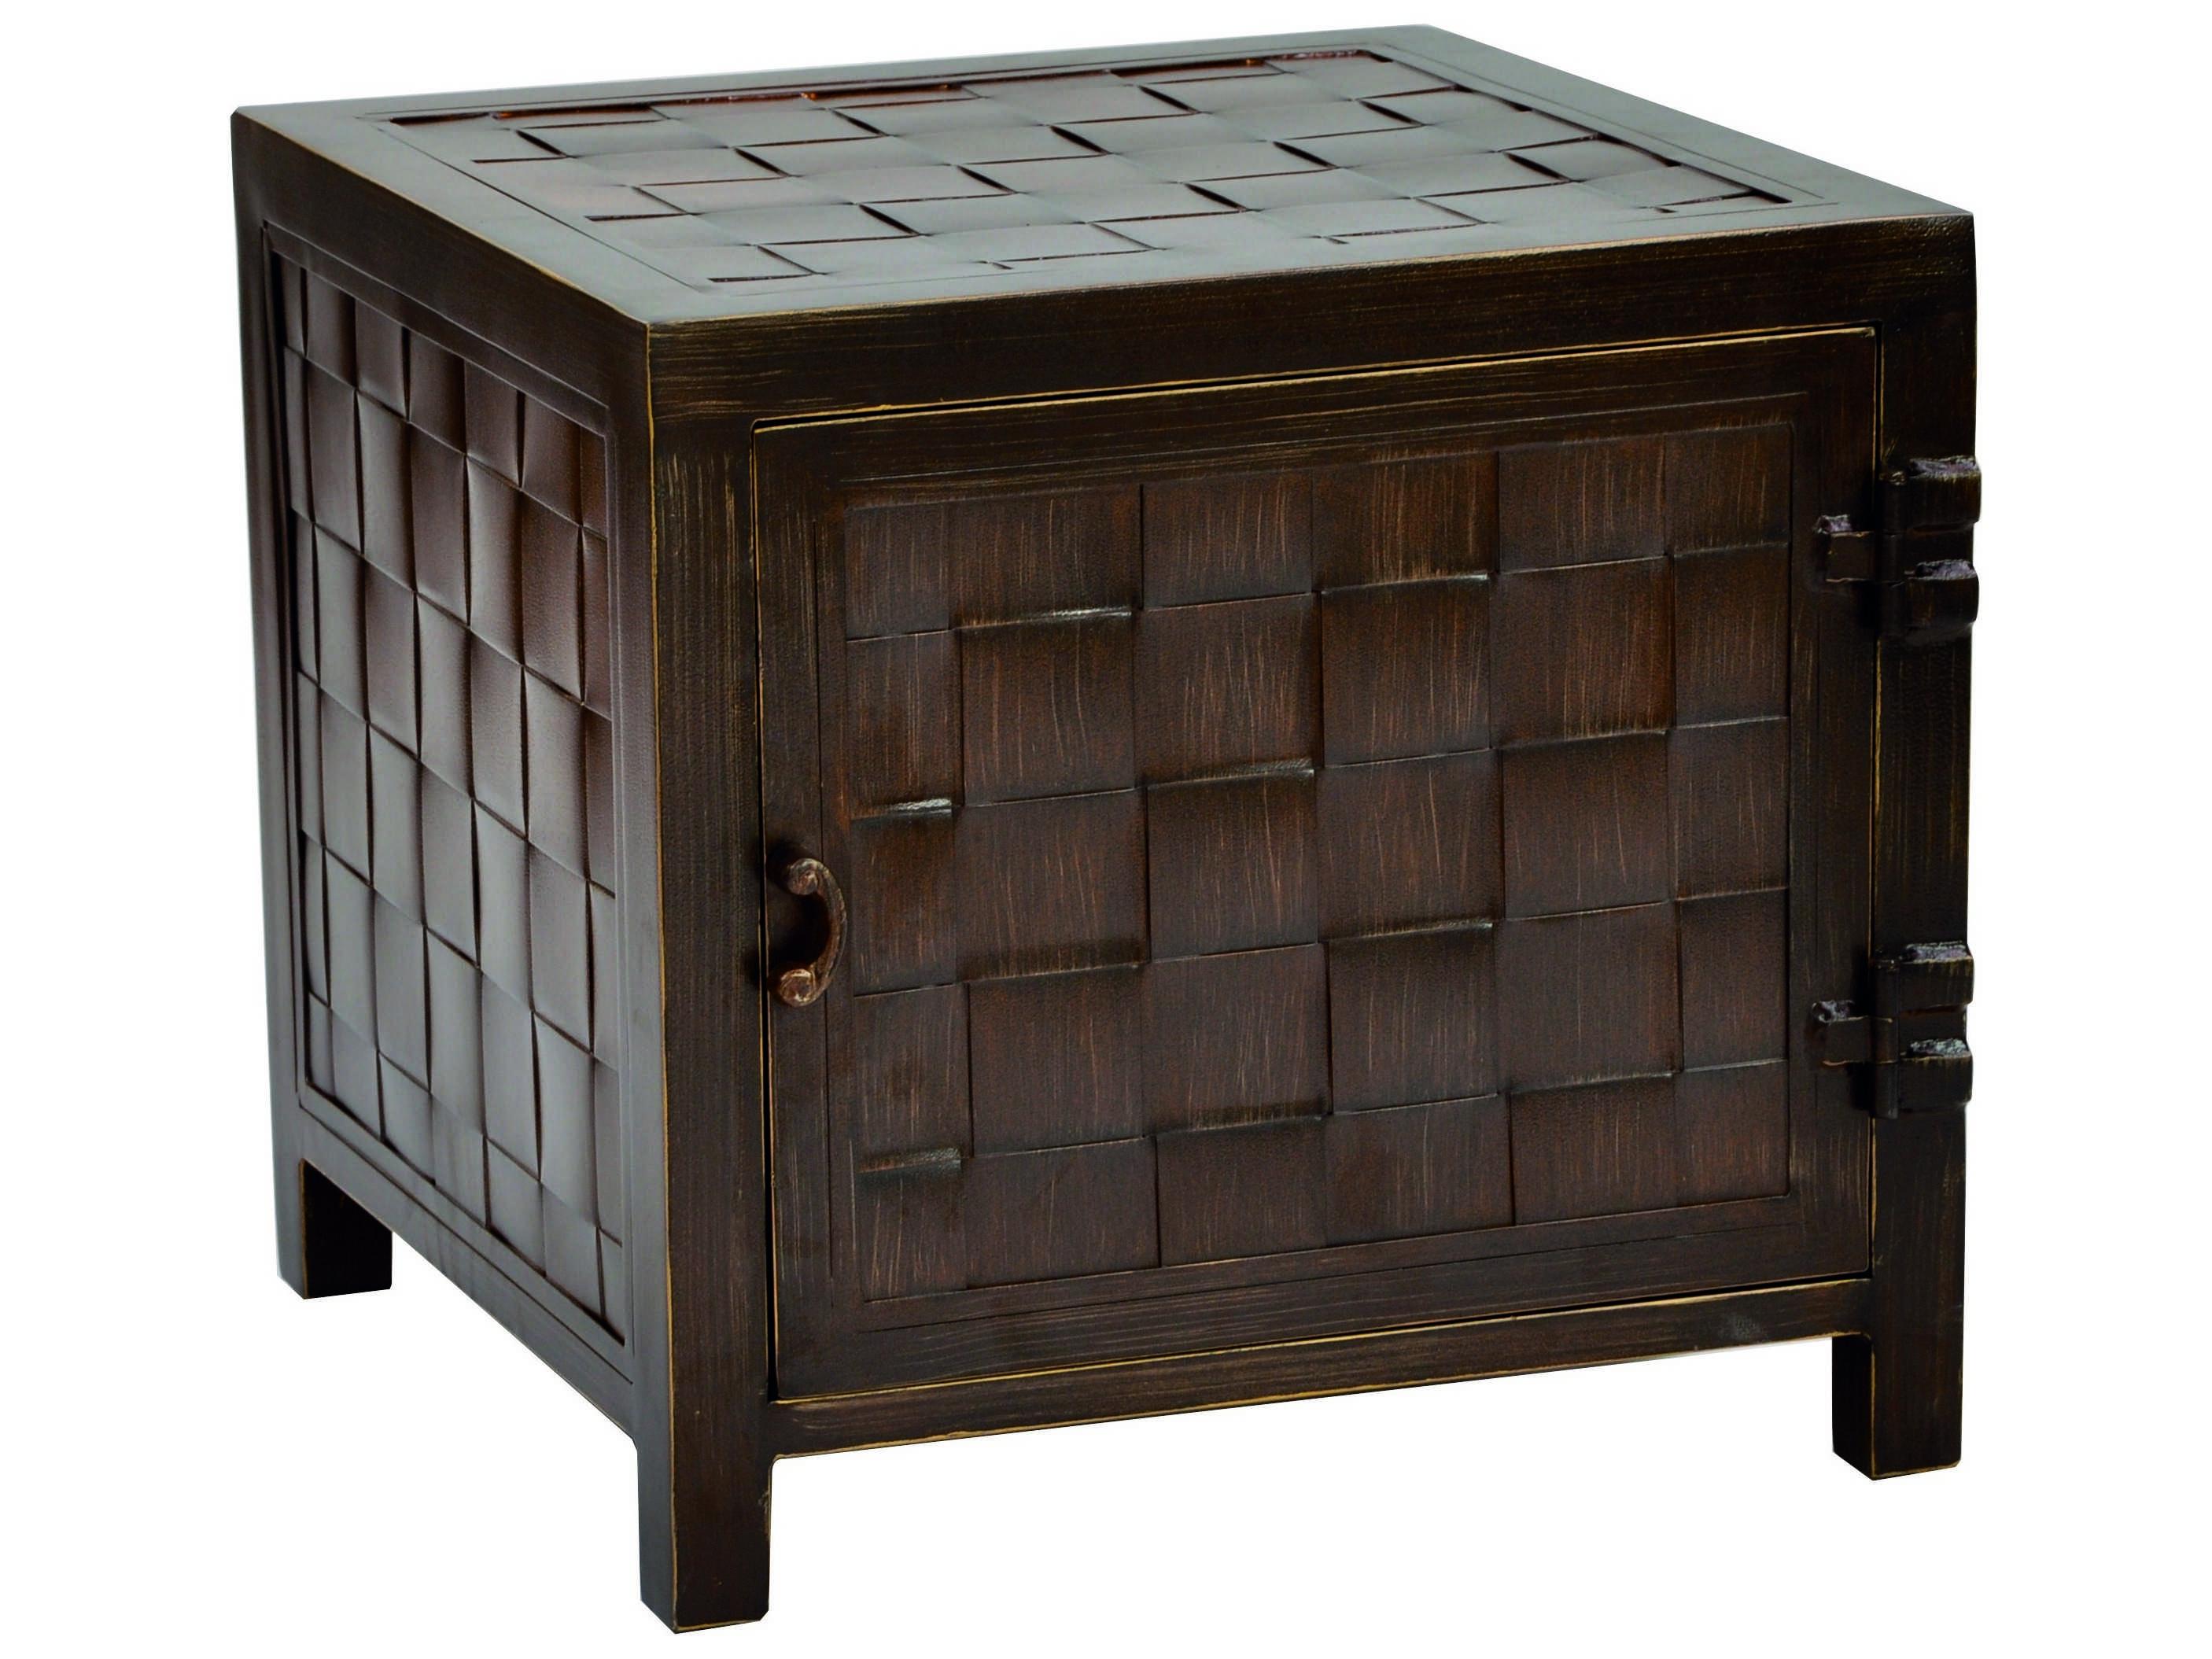 Castelle aluminum 20 square storage end table vss20 End tables with storage